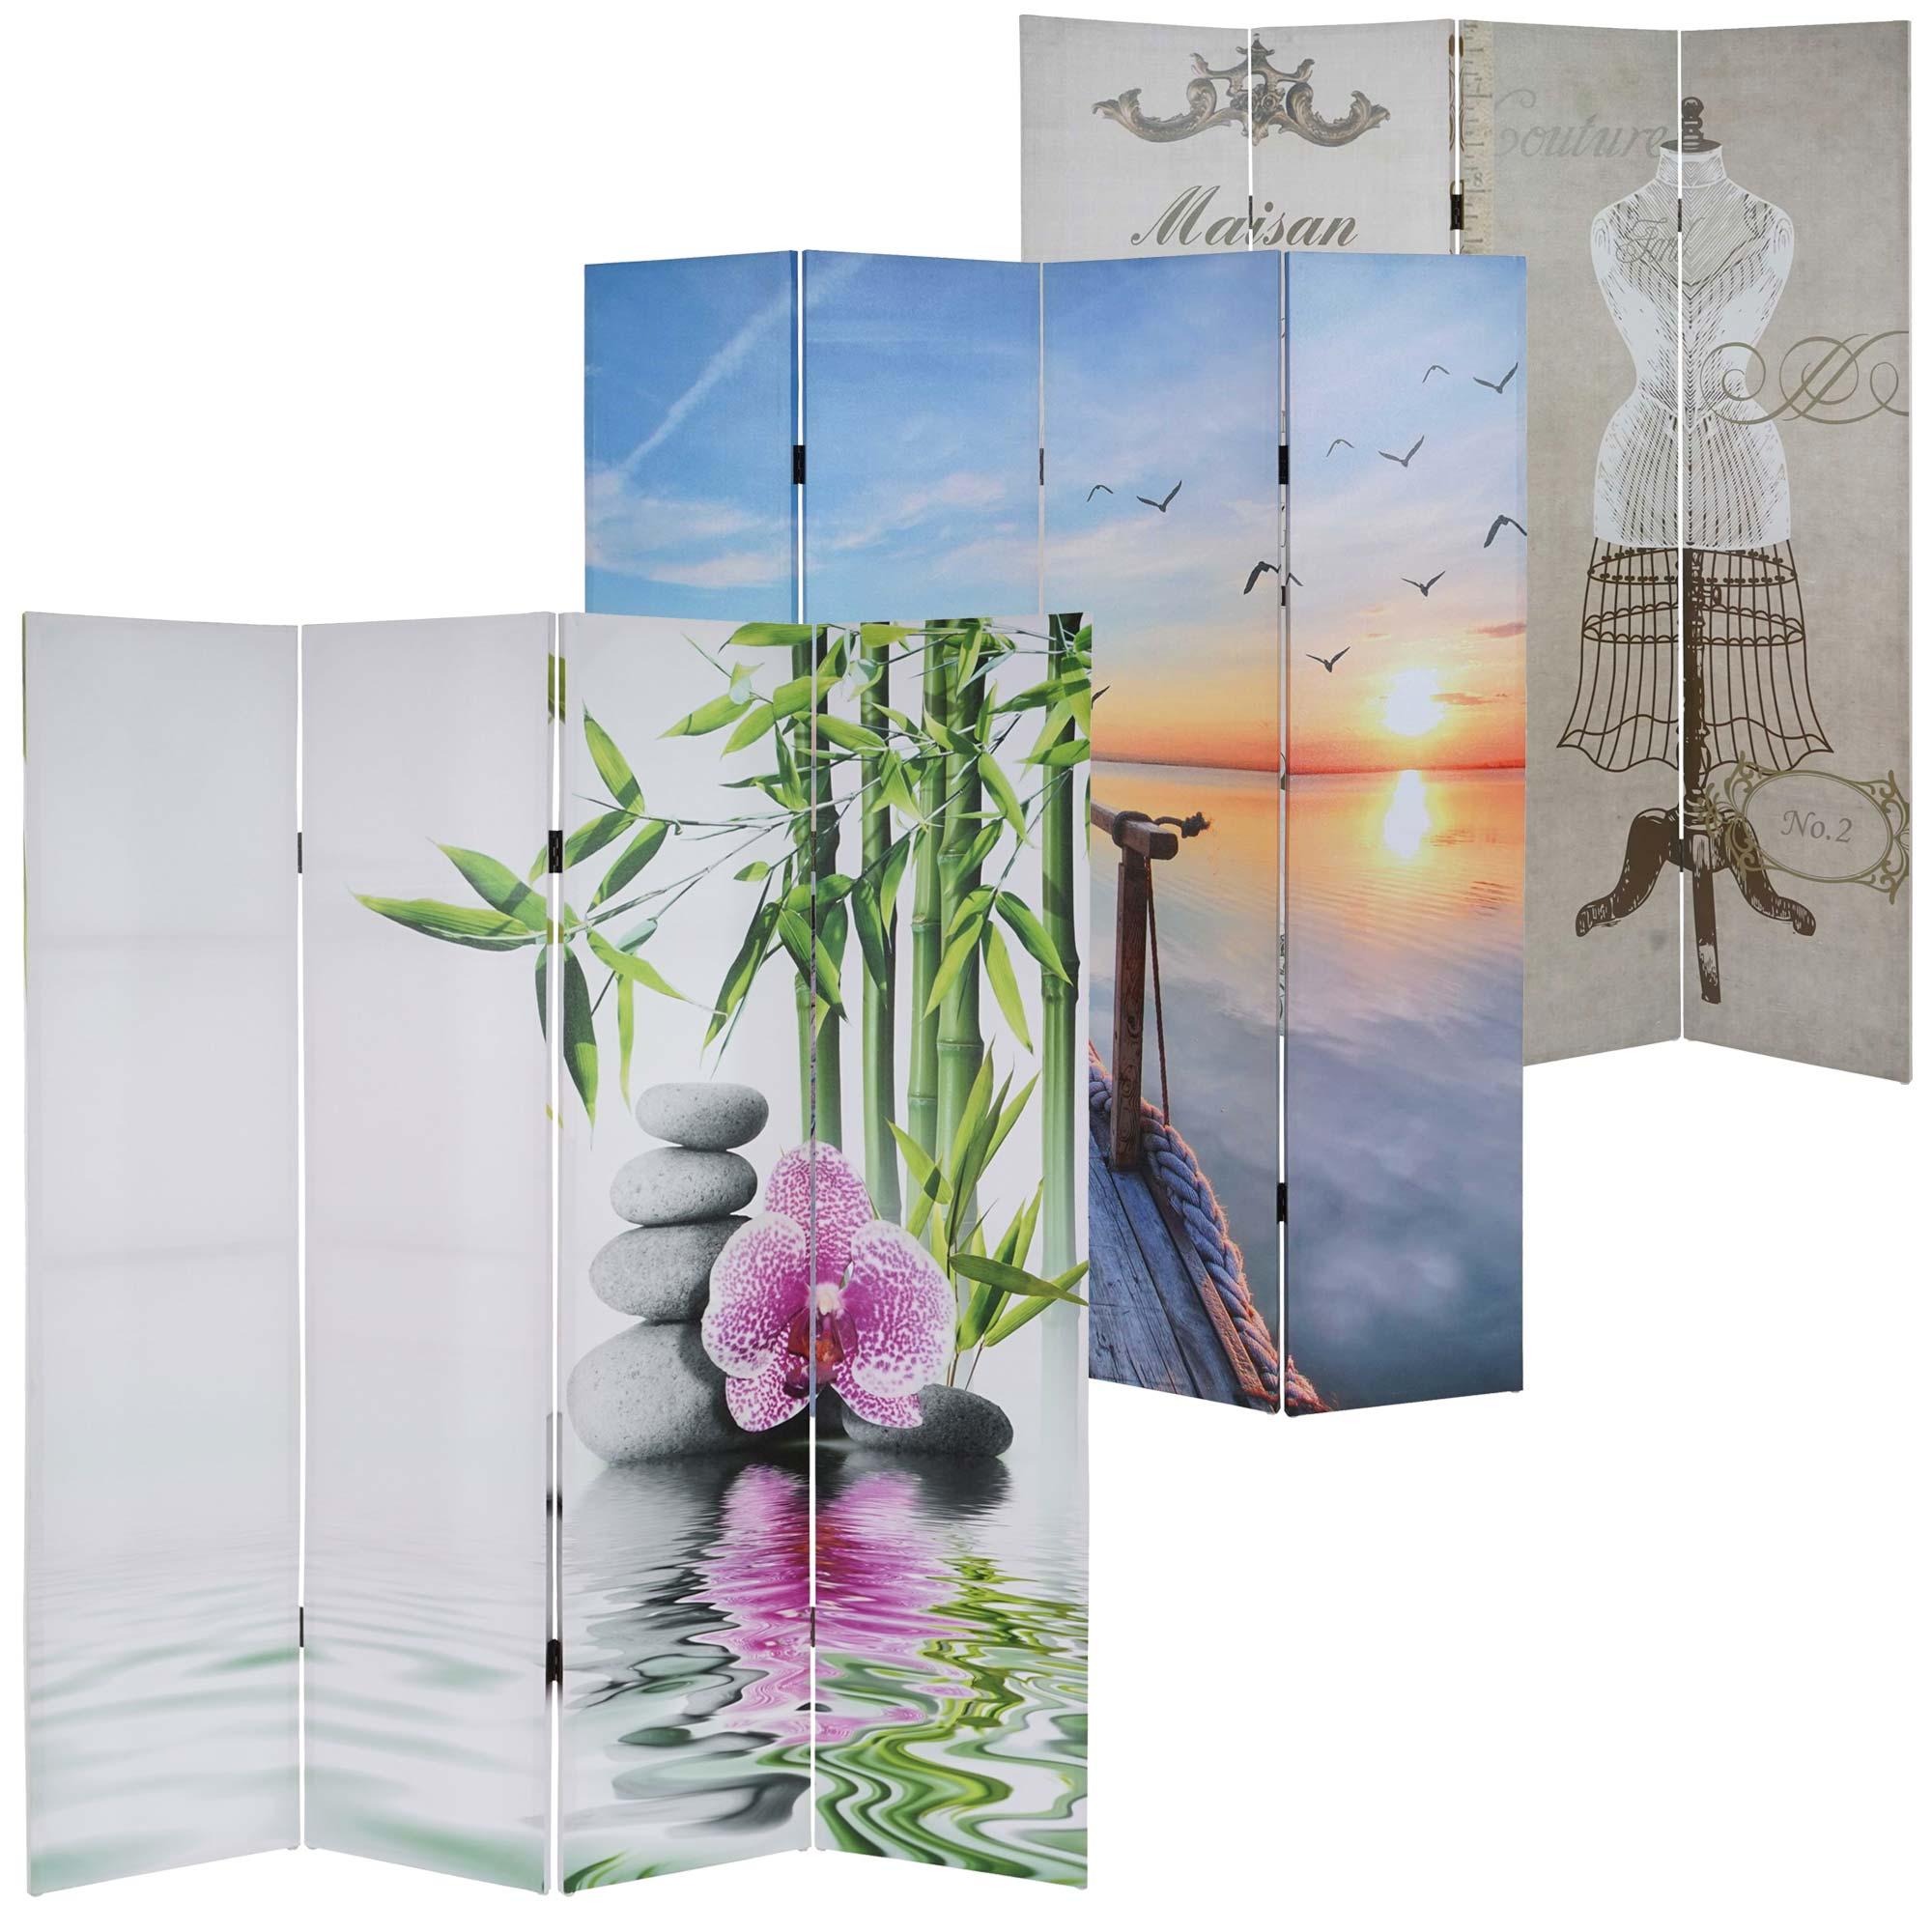 Mendler Foto-Paravent T234, Paravent Raumteiler Spanische Wand 180x160cm ~ Variantenangebot 35987